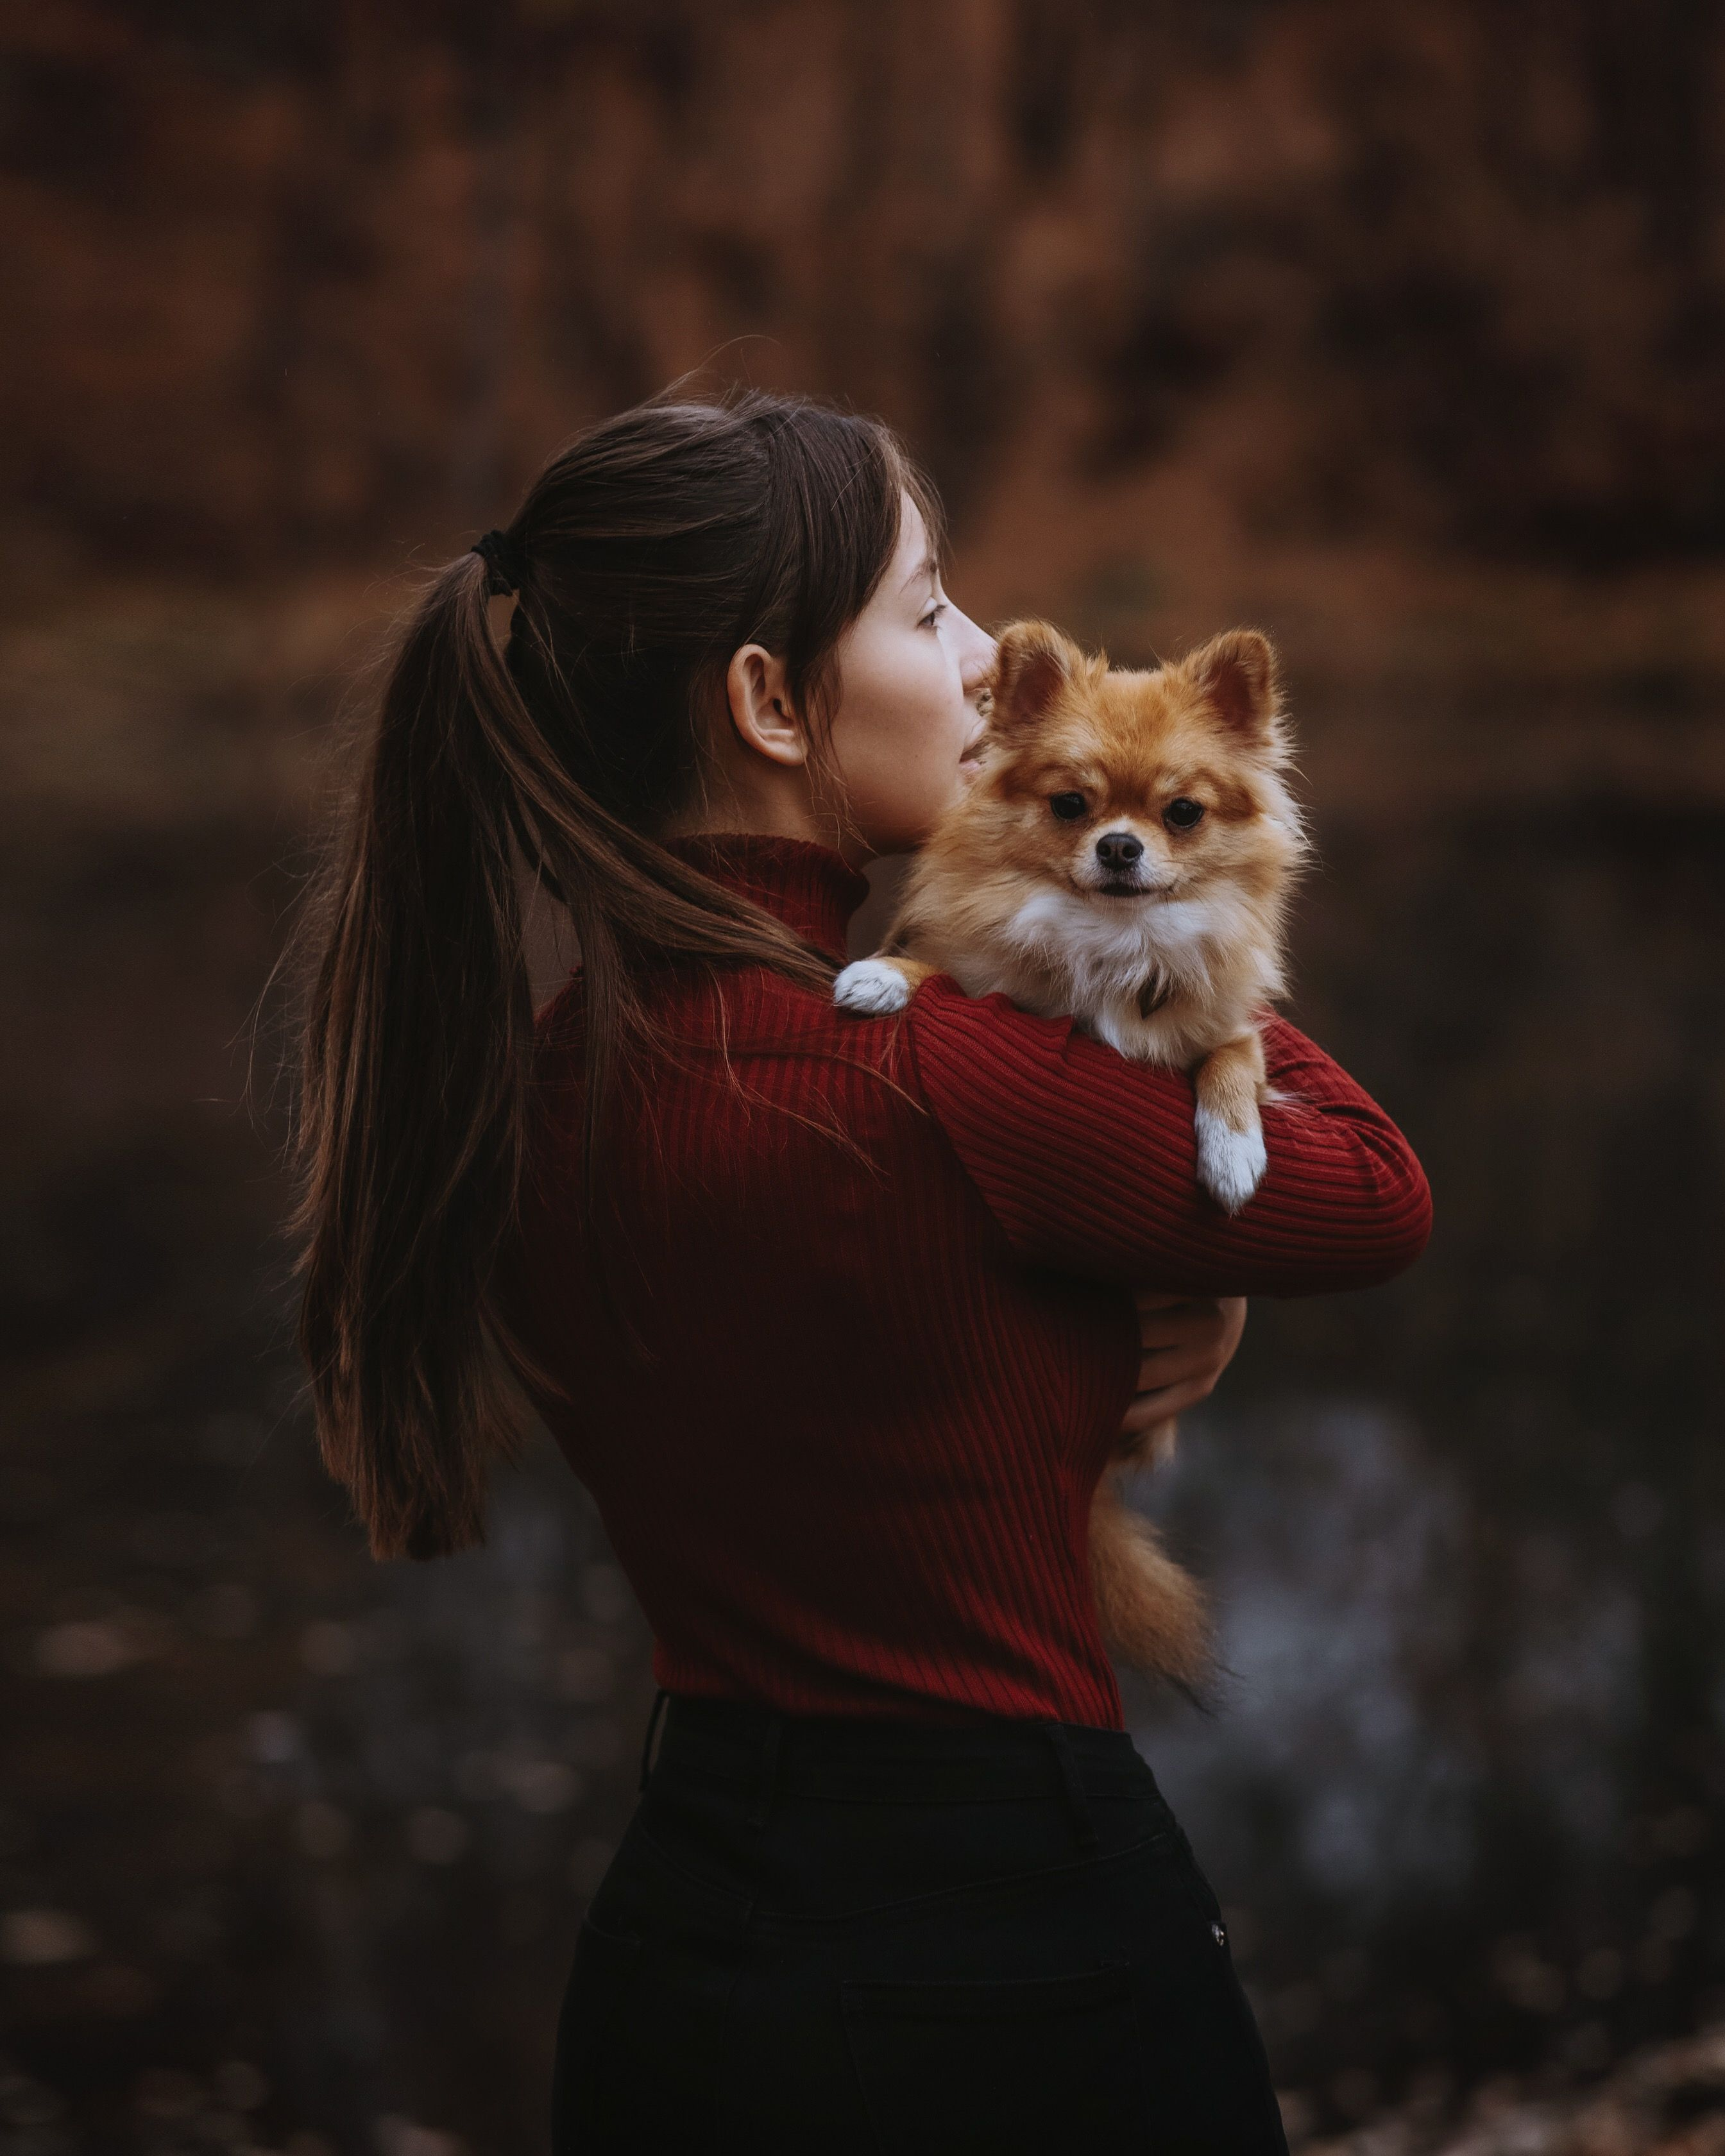 Картинки с собакой идеи